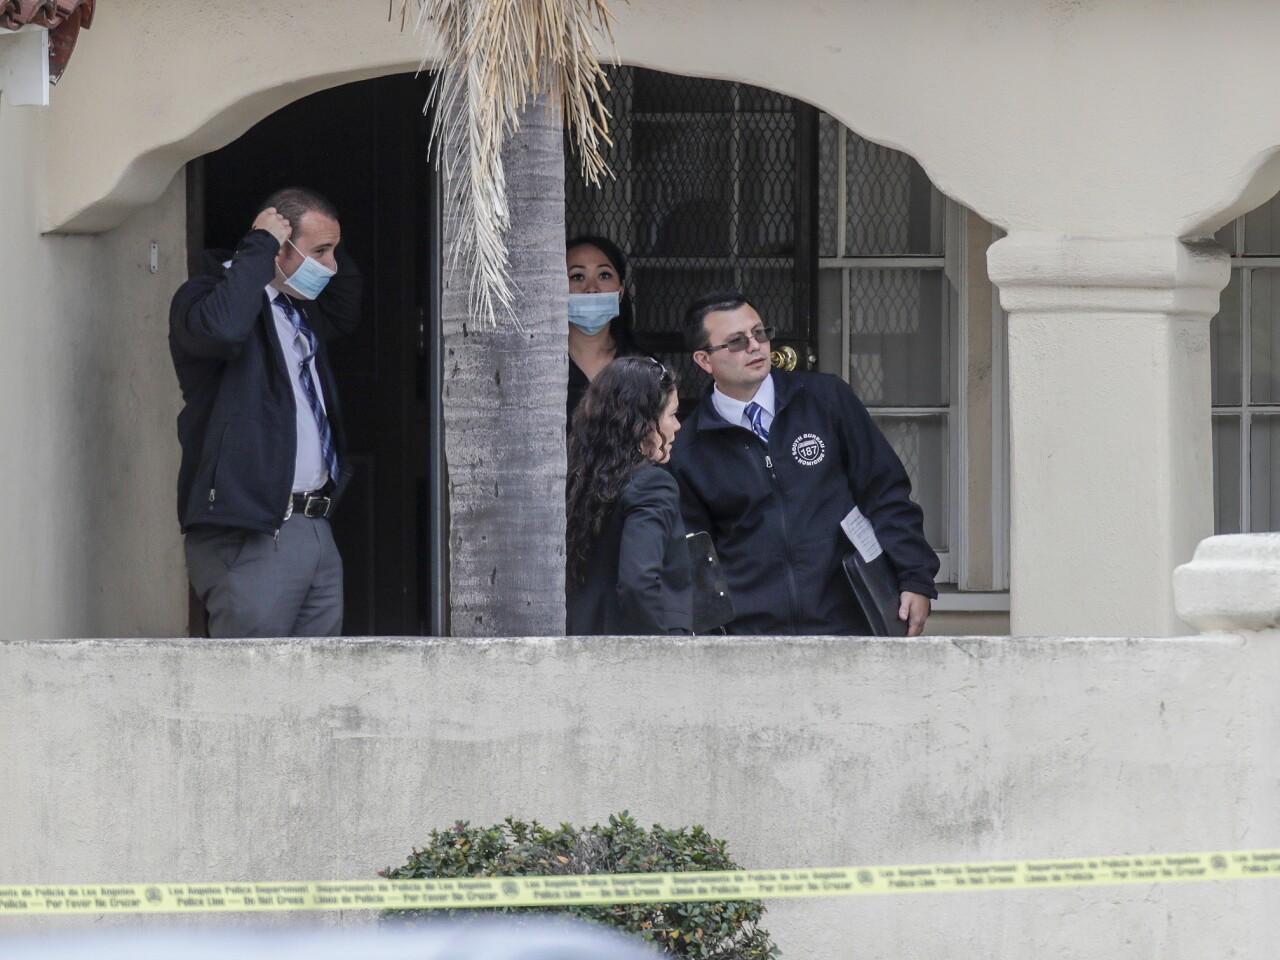 3 found dead in Leimert Park home